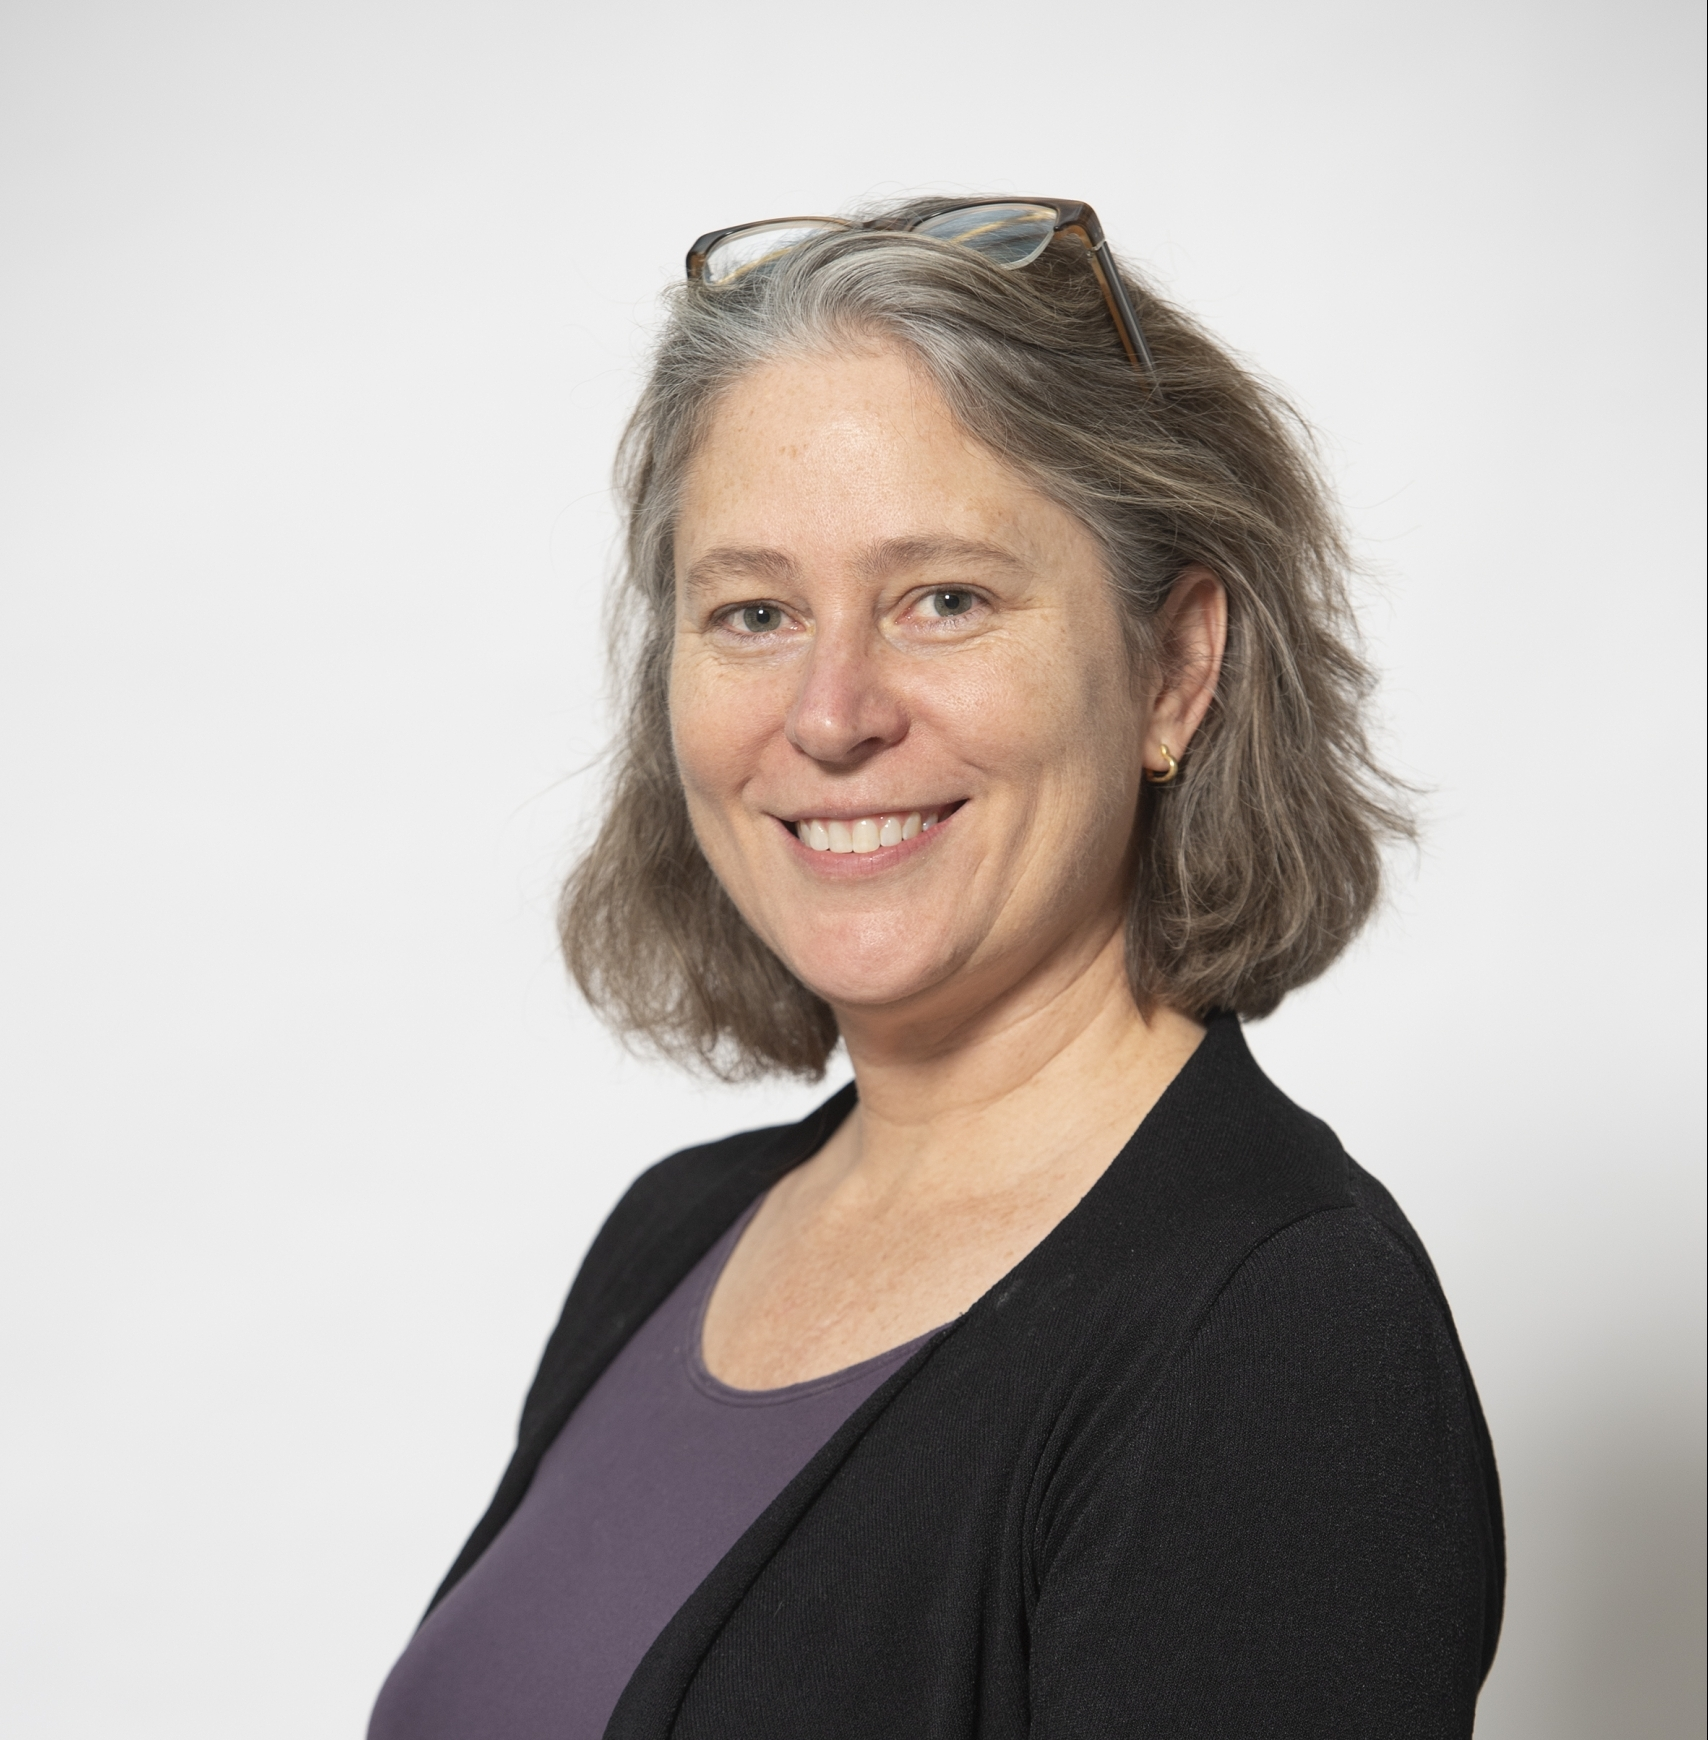 Kristin Komives